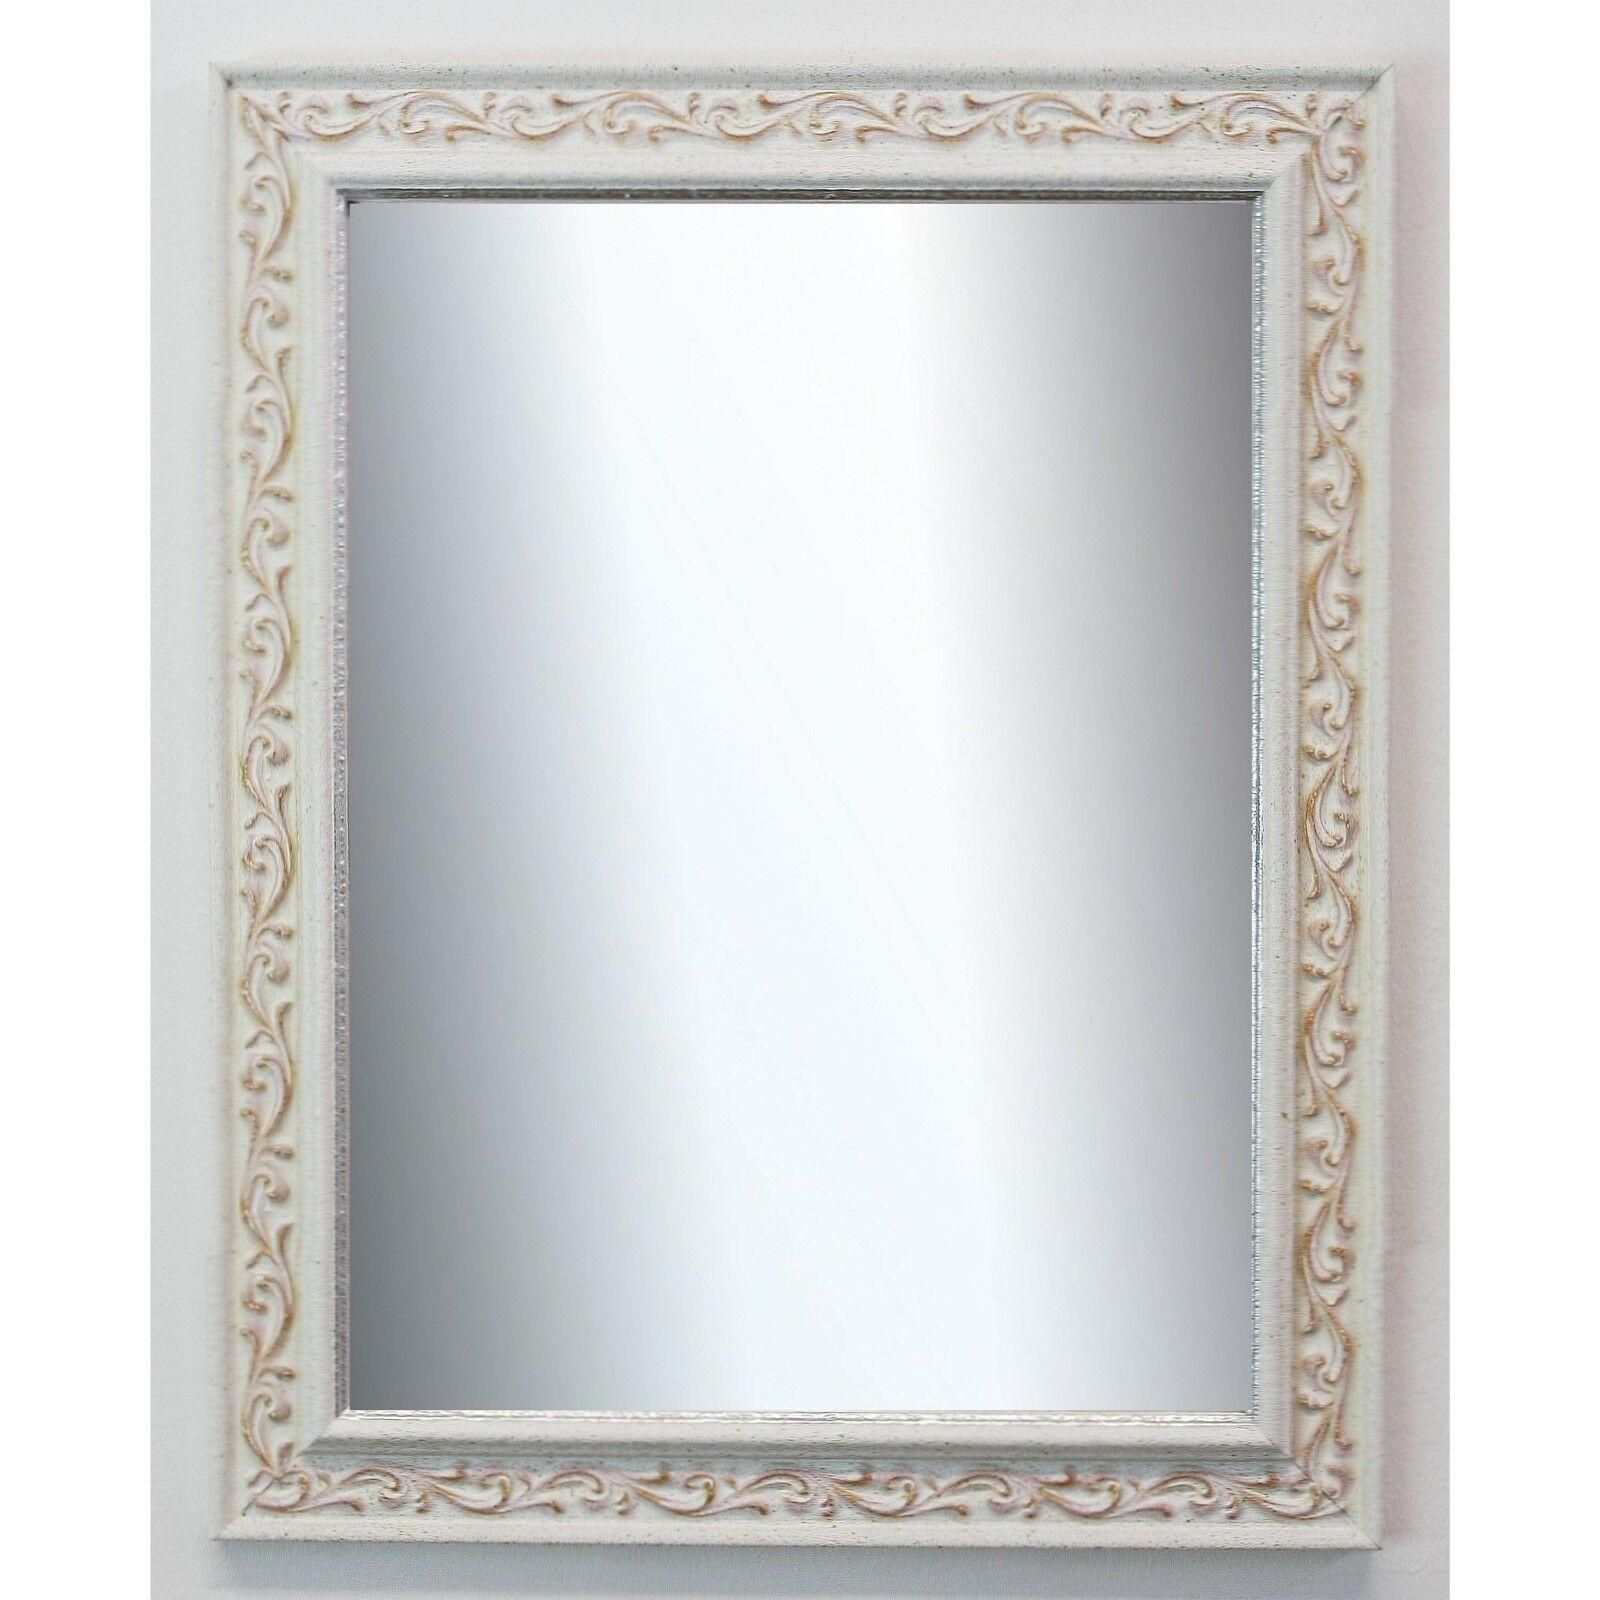 Spiegel Wandspiegel Badspiegel Flur Antik Barock Shabby Vintage ...